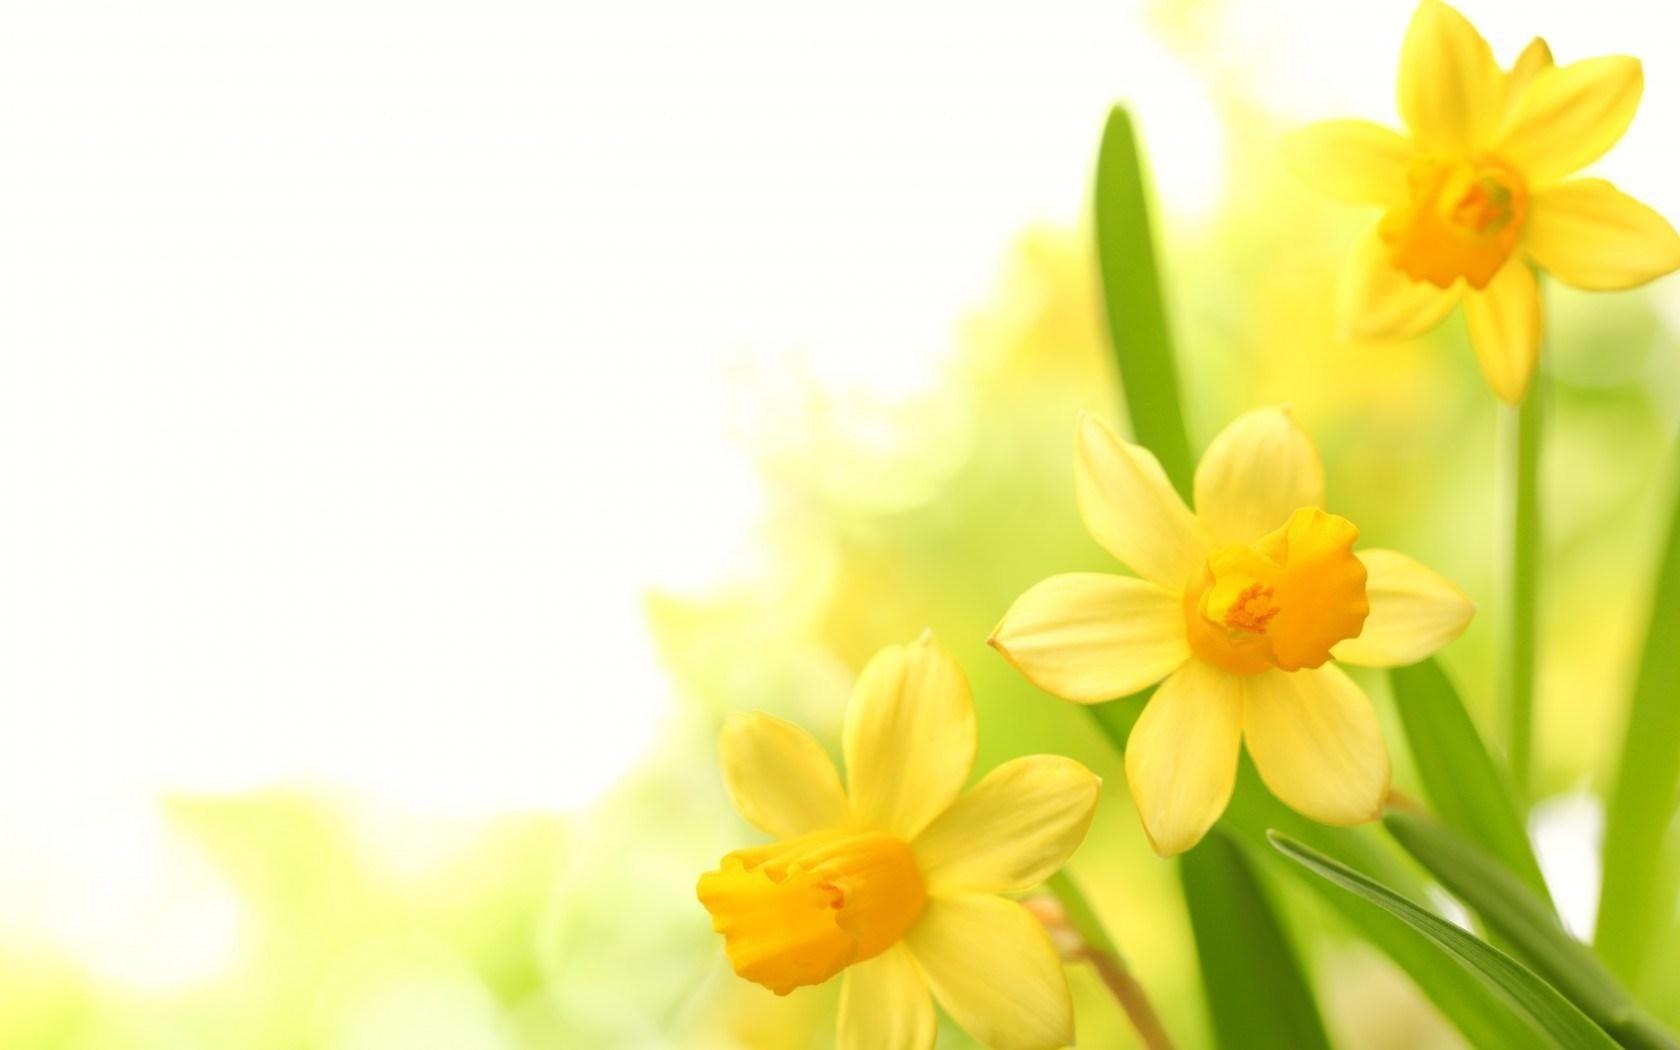 Good Yellow Flower Wallpaper Rose Flower Wallpaper Daffodil Flower Daffodils